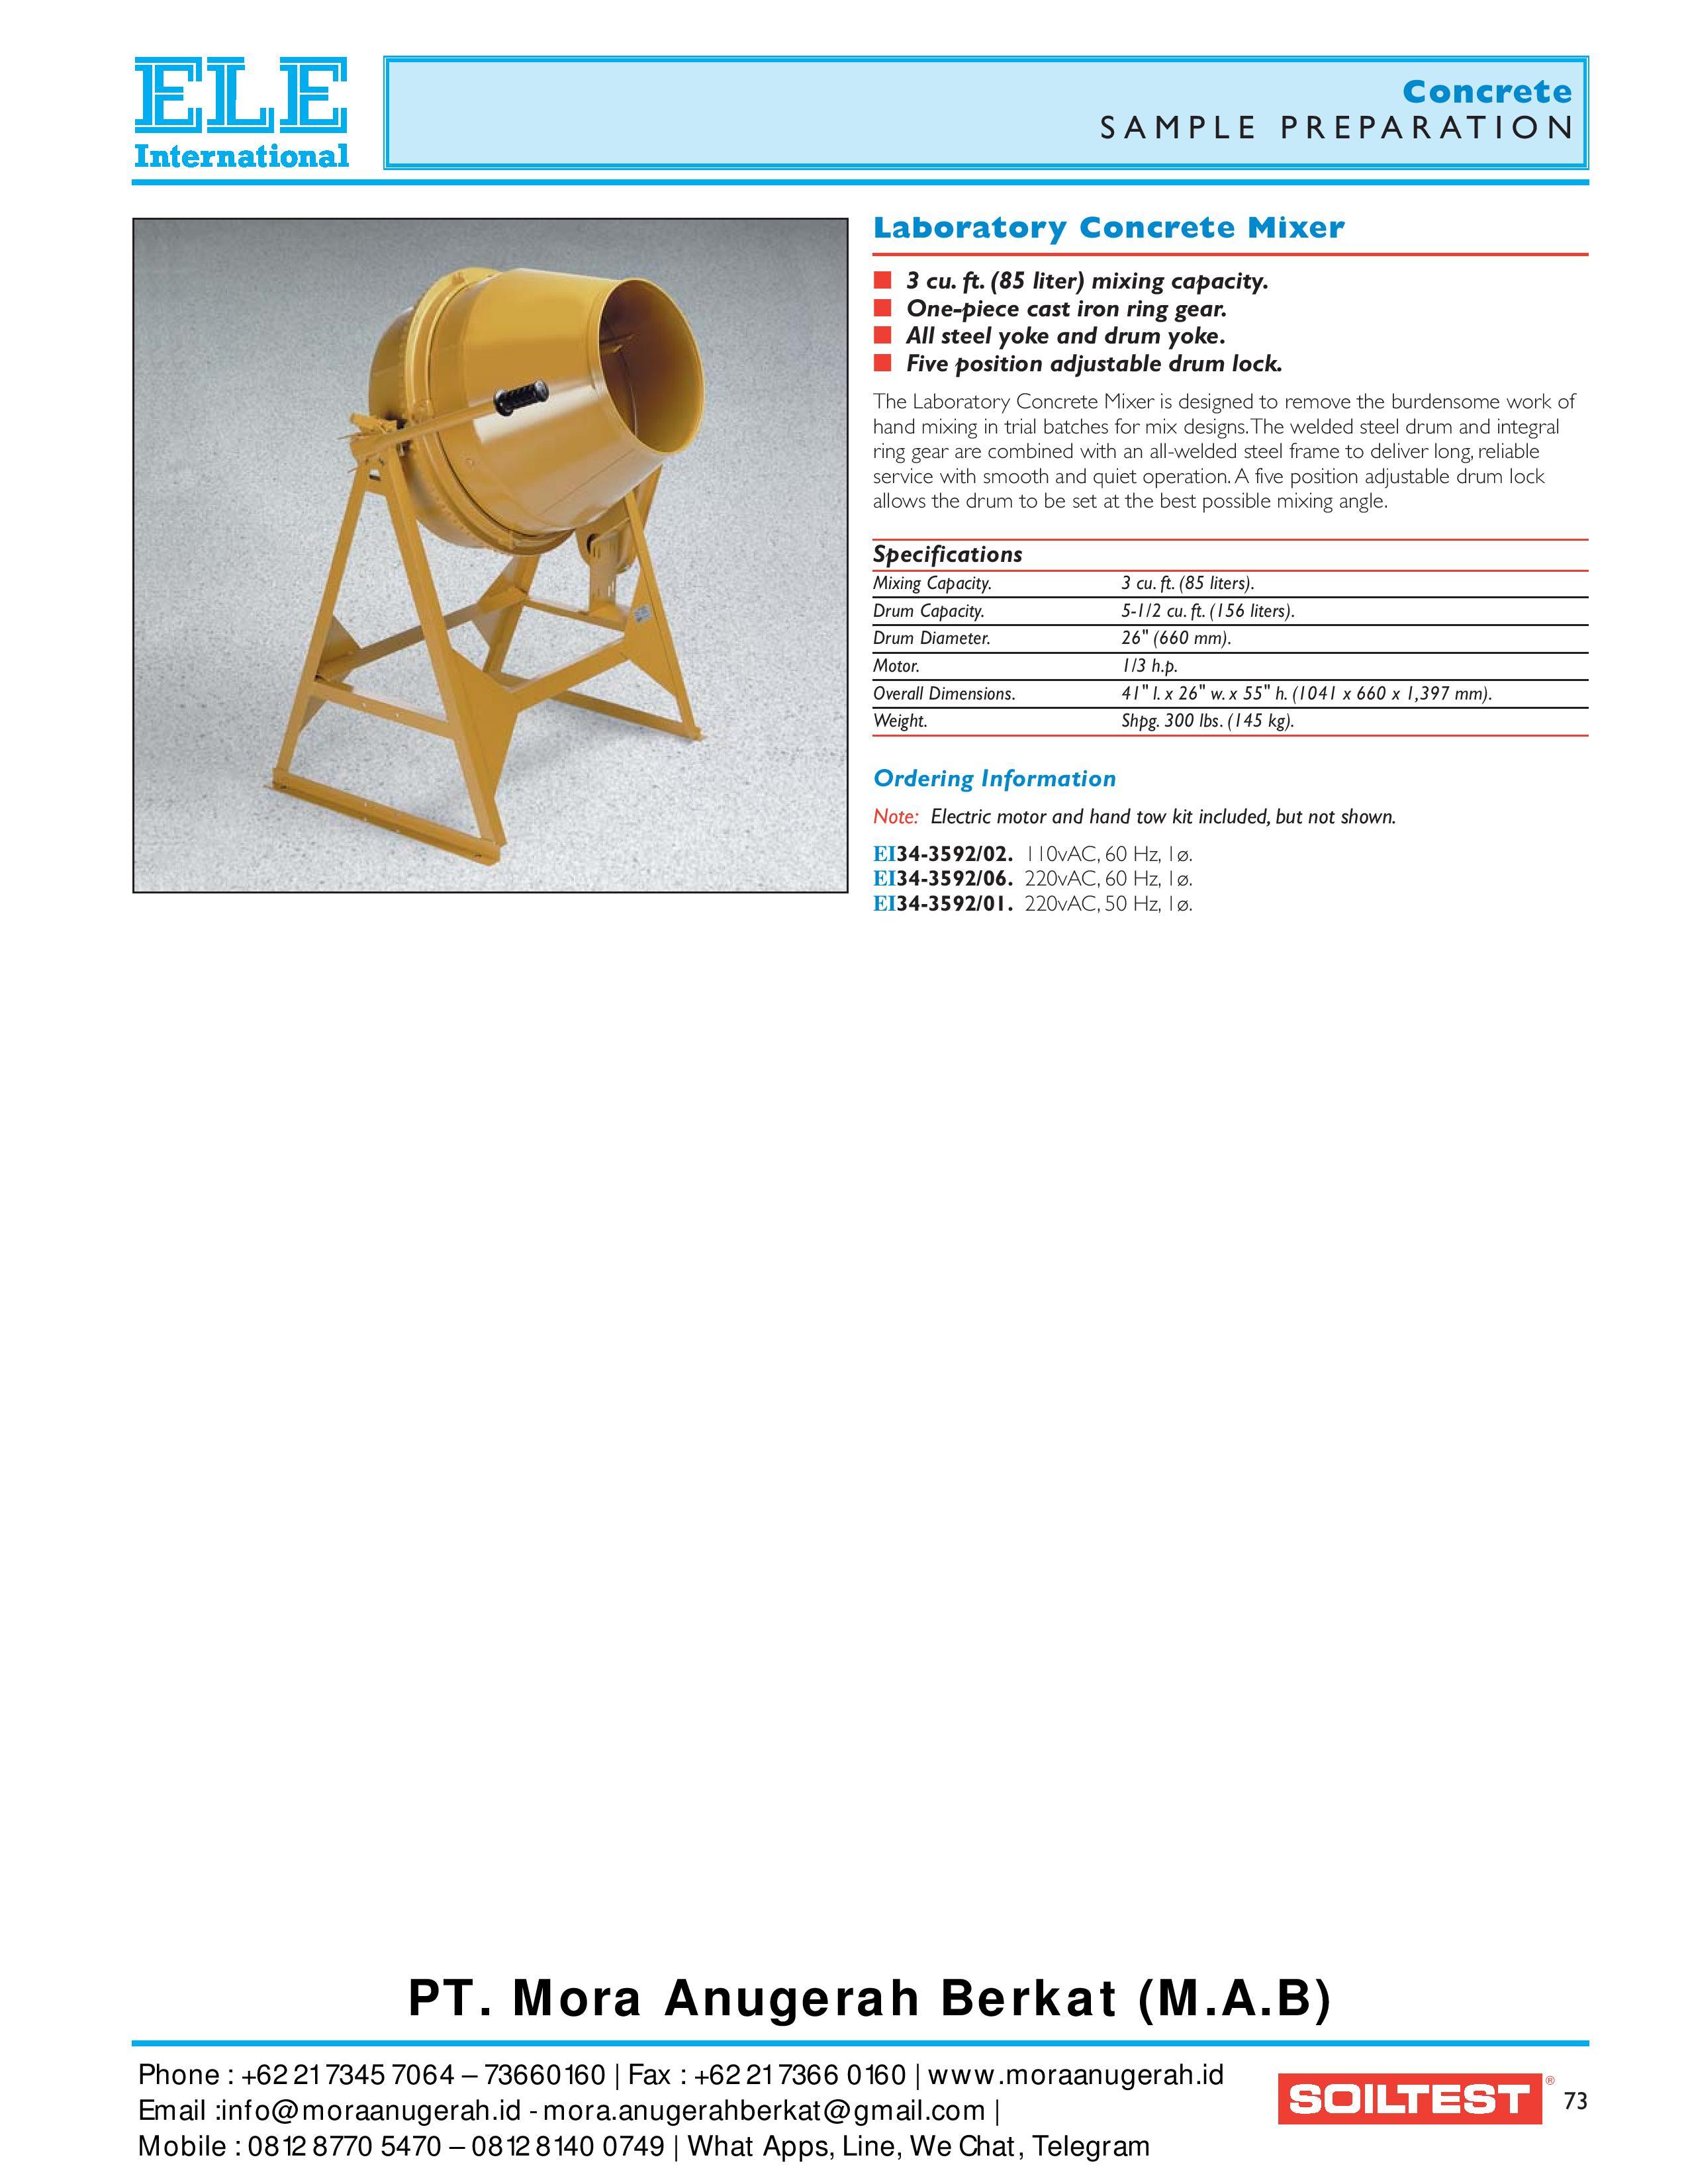 Concrete Testing Equipment Product - Ele Internasional | Supplier